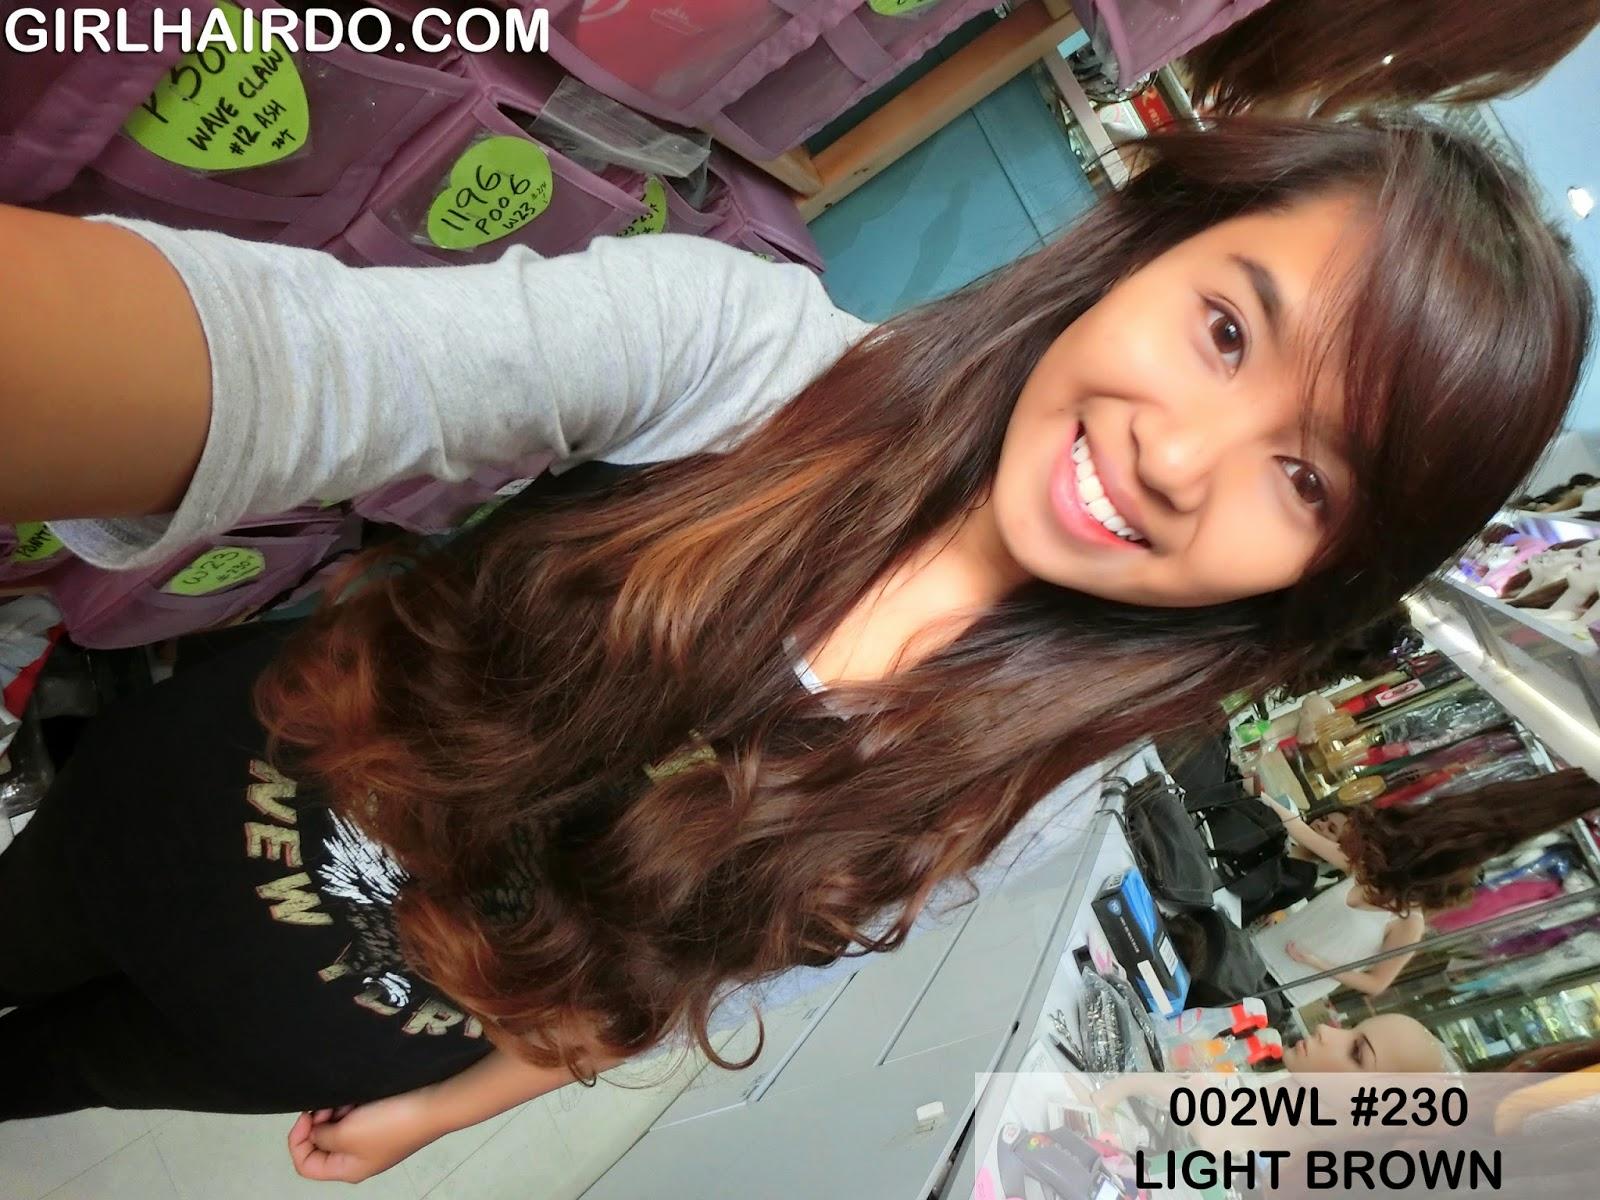 http://3.bp.blogspot.com/-mTJuVy0IRY4/U8_lnqQXjdI/AAAAAAAATGA/tKMn94ncr74/s1600/GIRLHAIRDO+HAIR+EXTENSIONS+WIGS+SINGAPORE.jpg